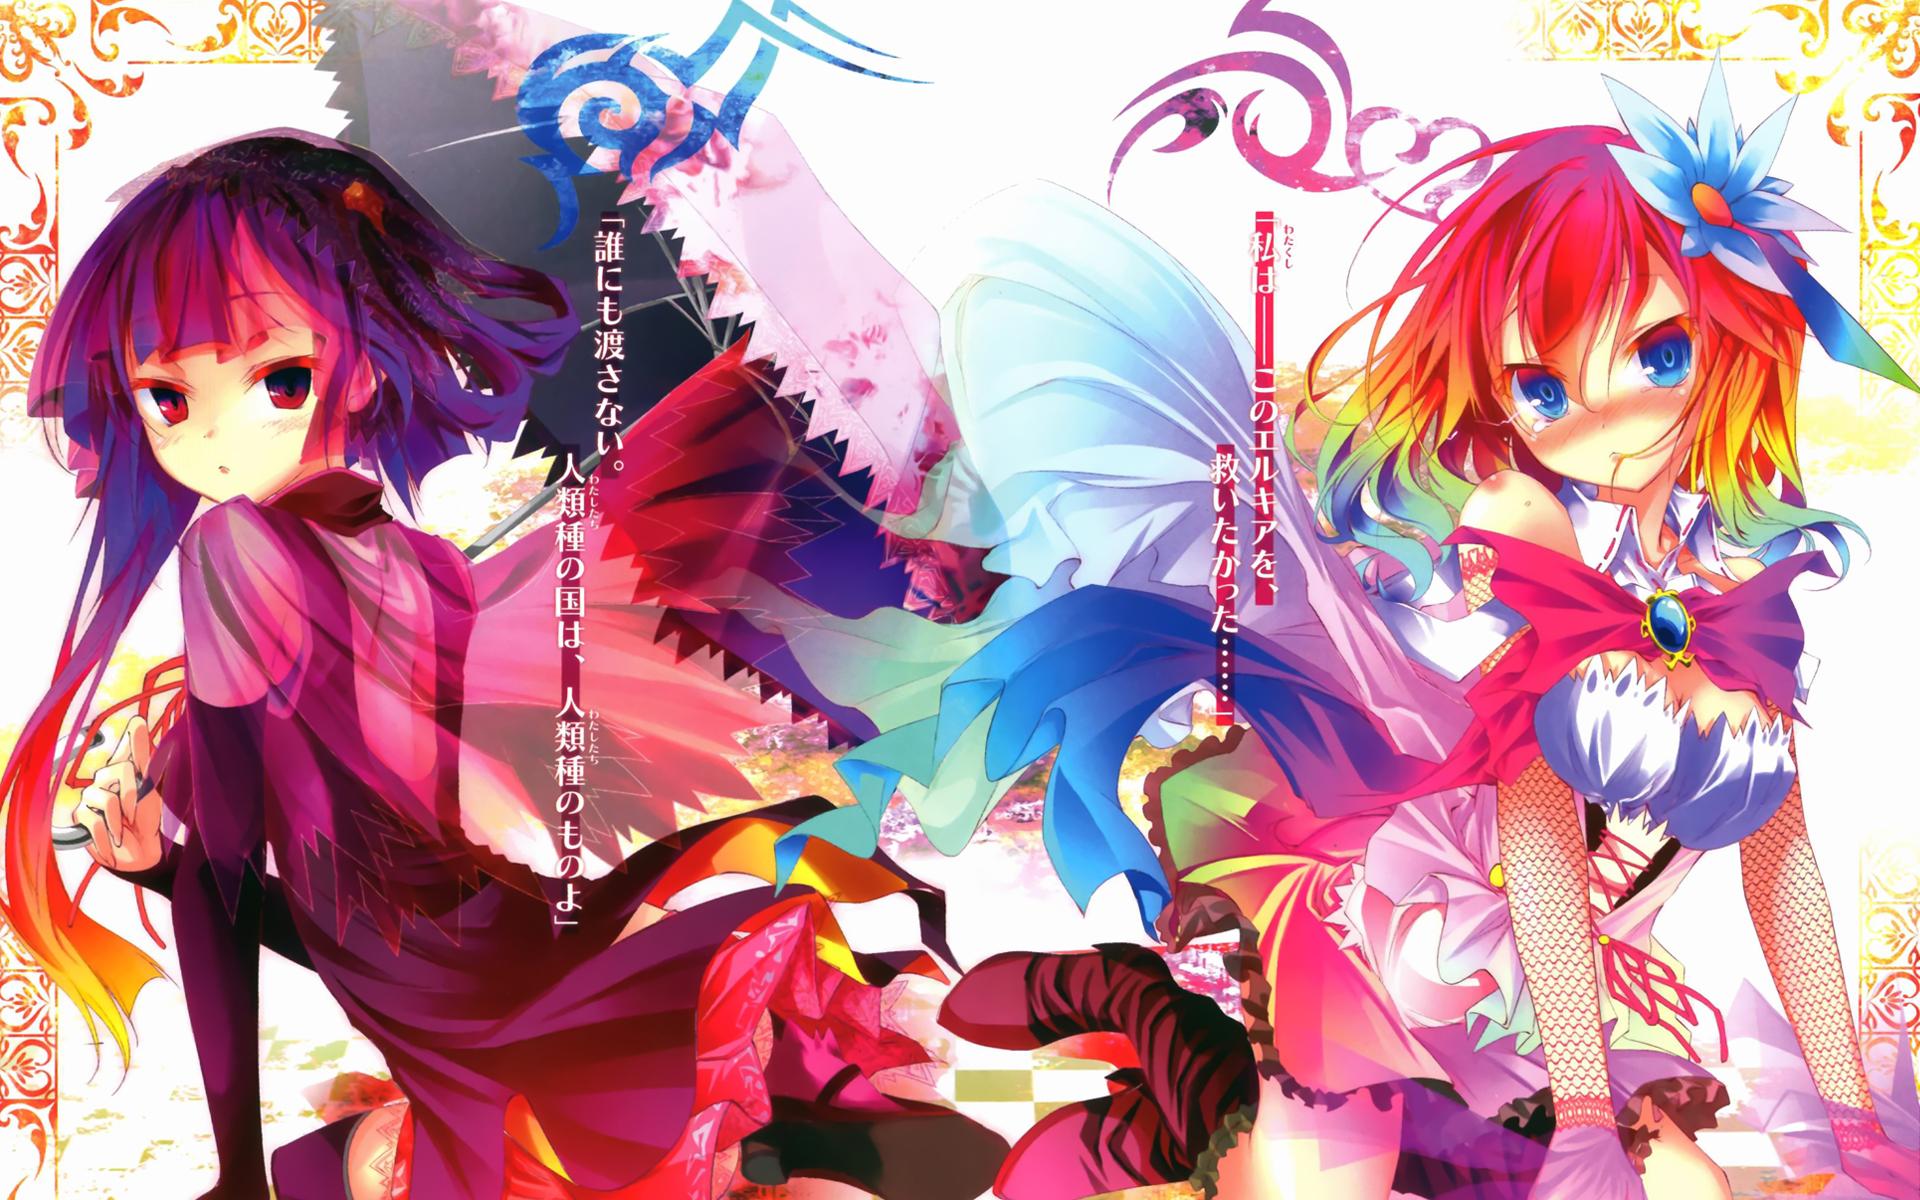 no game no life anime girls spring 2014 hd wallpaper 1920x1200 full 1920x1200